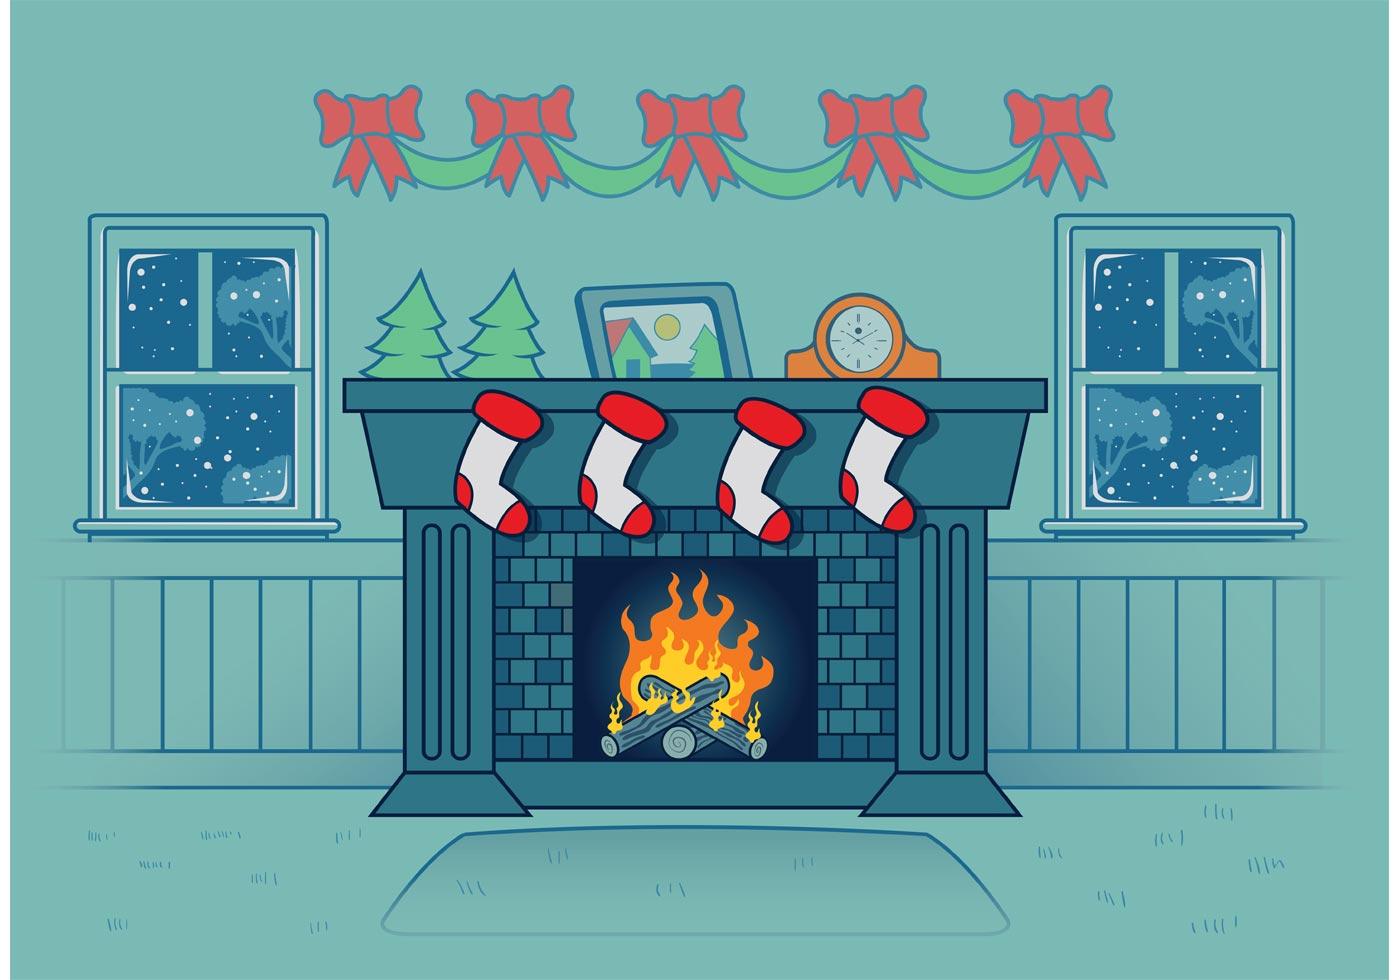 Fireplace Free Vector Art - (1319 Free Downloads)